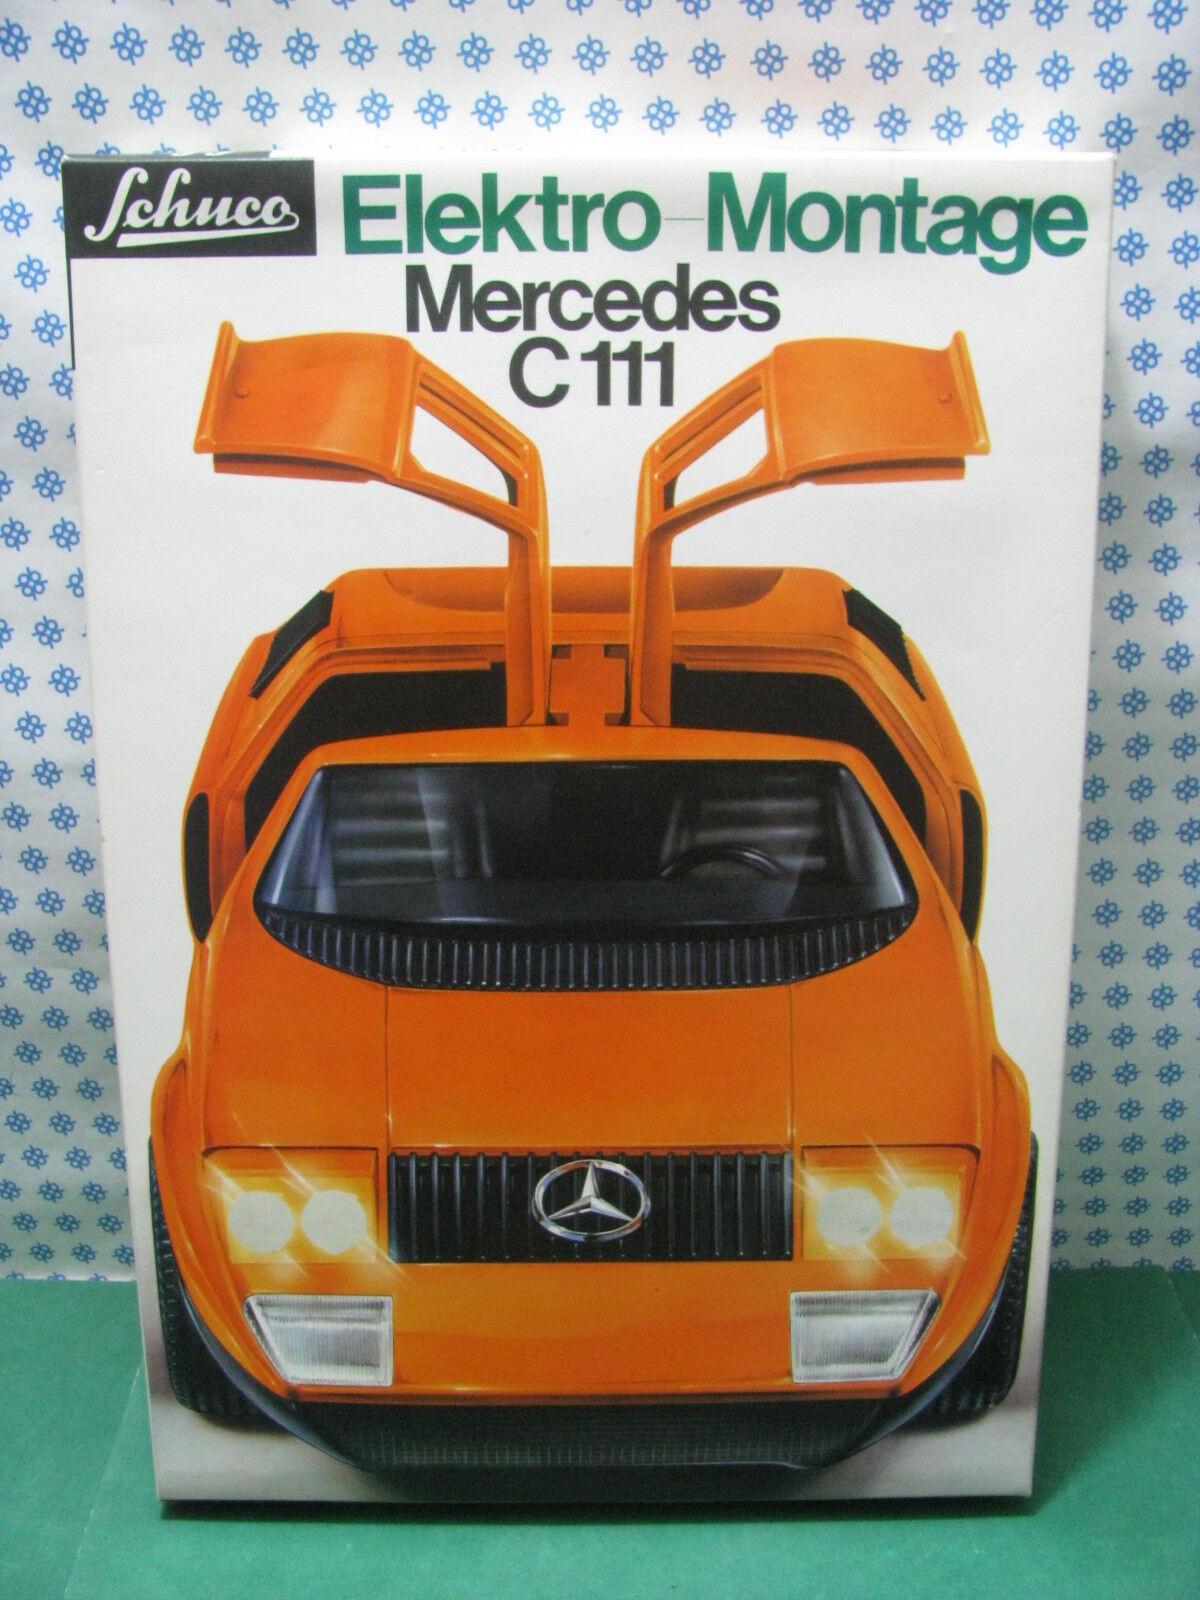 Estremely RARE SCHUCO  5508  - MERCEDES  C111 Elektro  Montage   -  Nuova   Mint